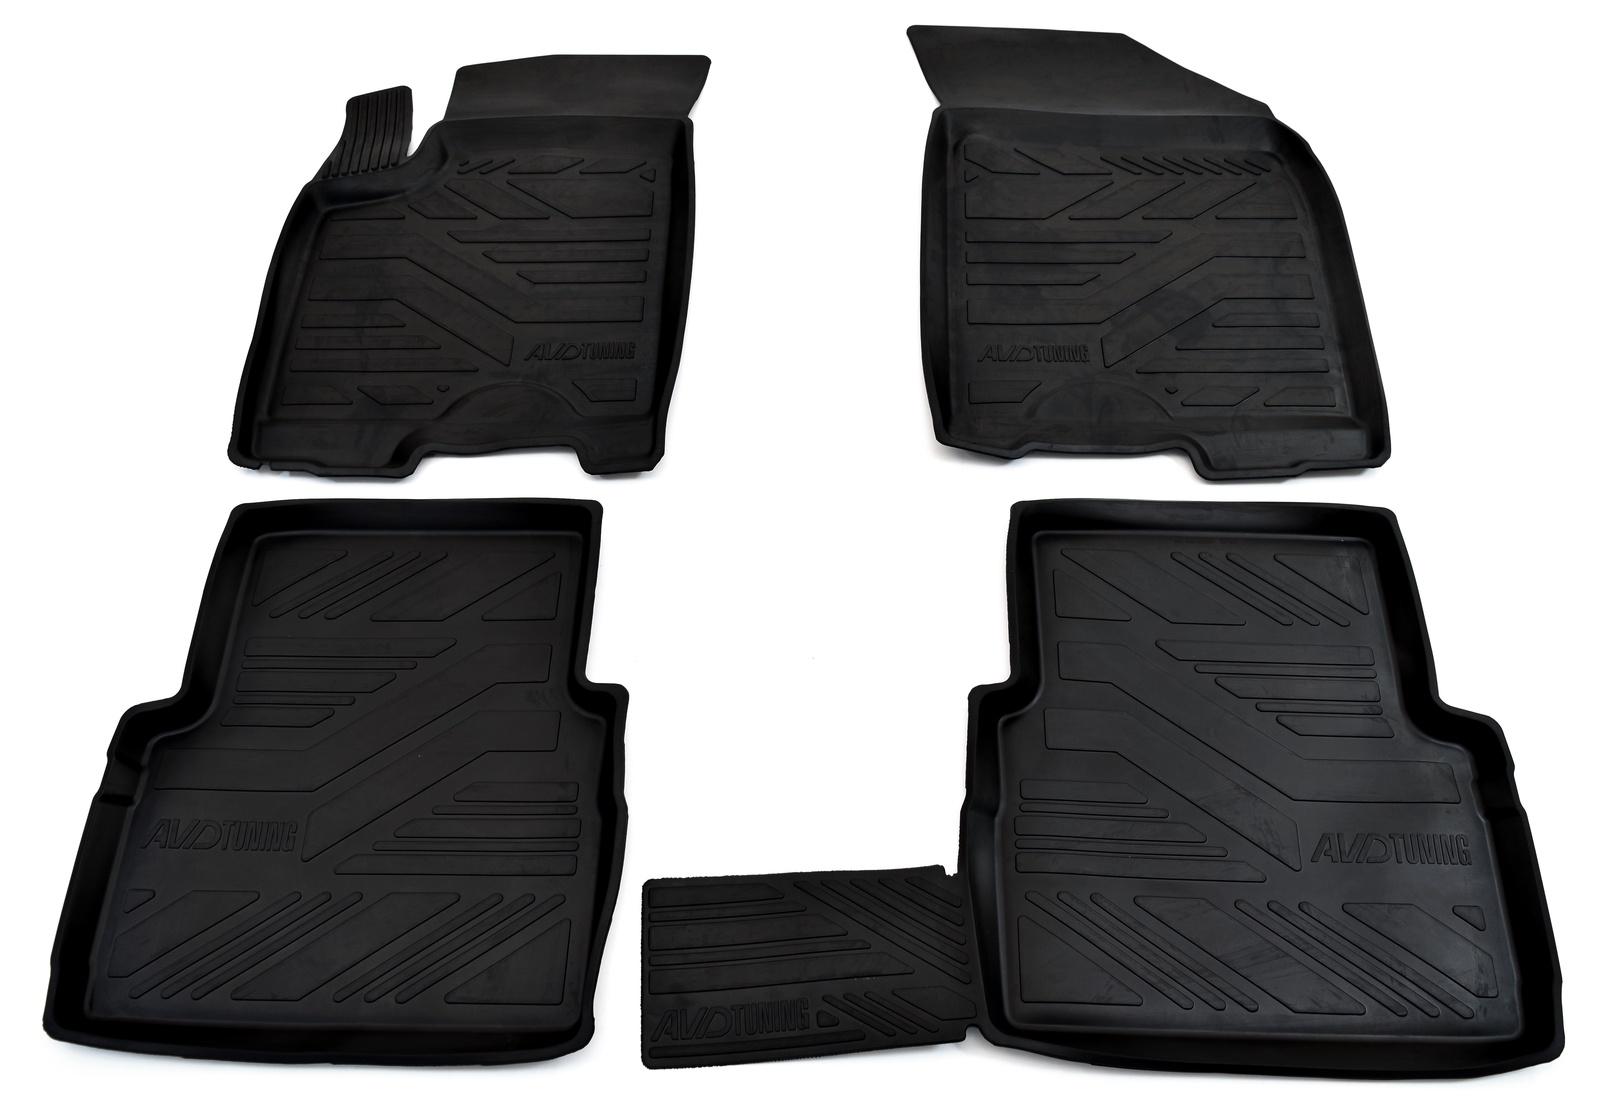 Коврики салона Avd Tuning для Renault Duster 4 wd (2011-2015) / Nissan terrano 4wd (2014-) adrplr279, резиновые, с бортиком коврики салона avtodriver для renault duster передний привод 2011 adrjet023 резиновые с бортиком черный